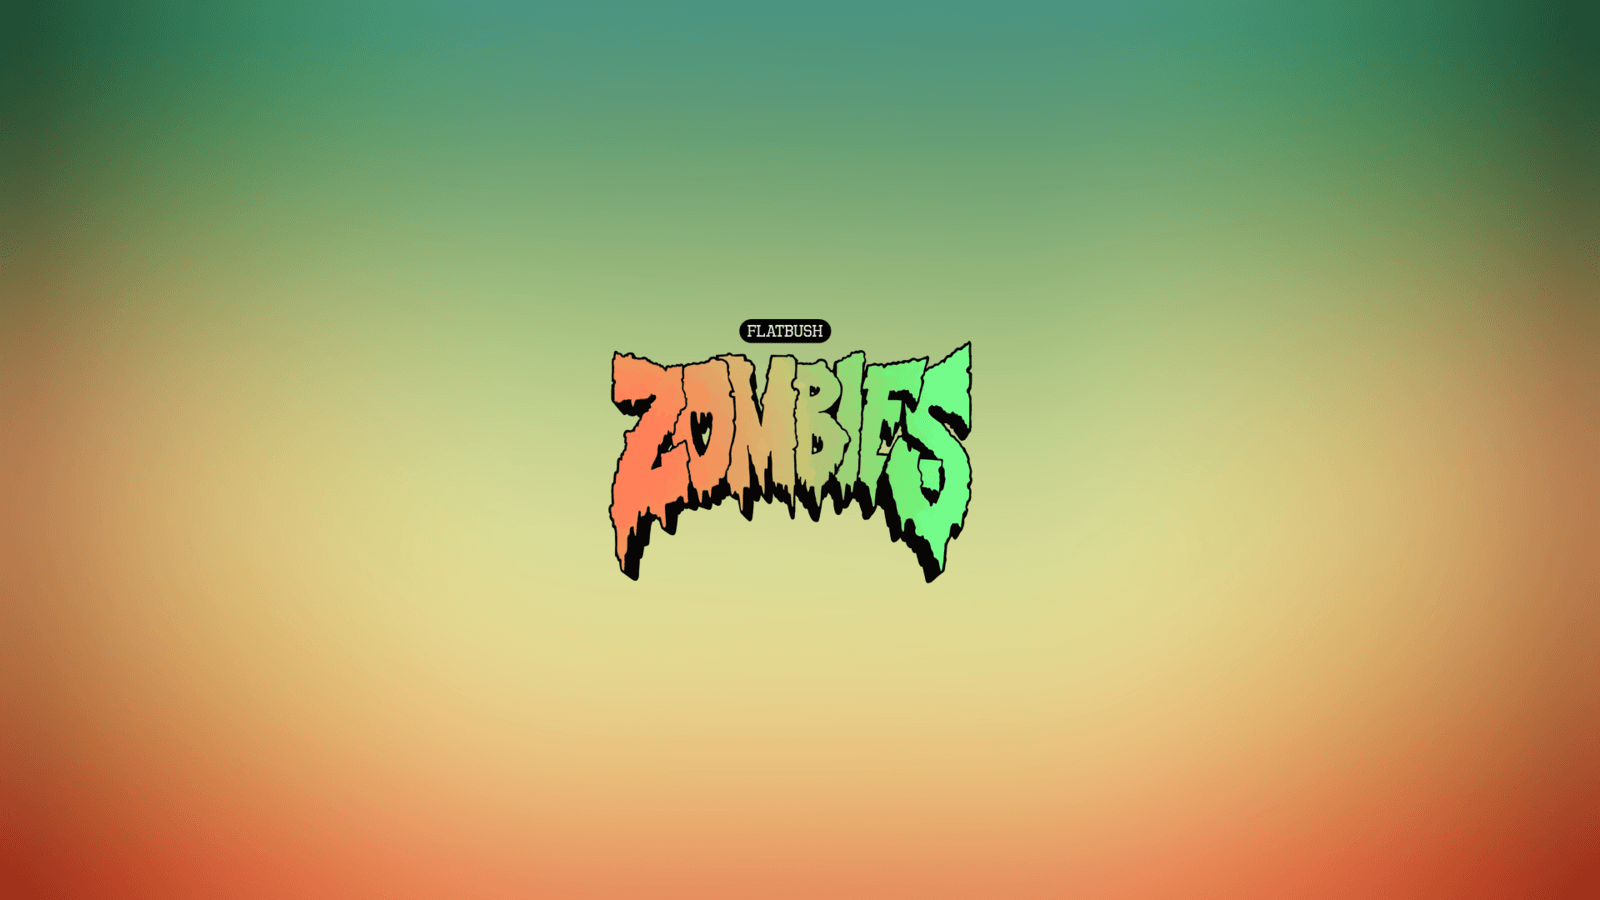 Flatbush Zombies Wallpapers - Wallpaper Cave